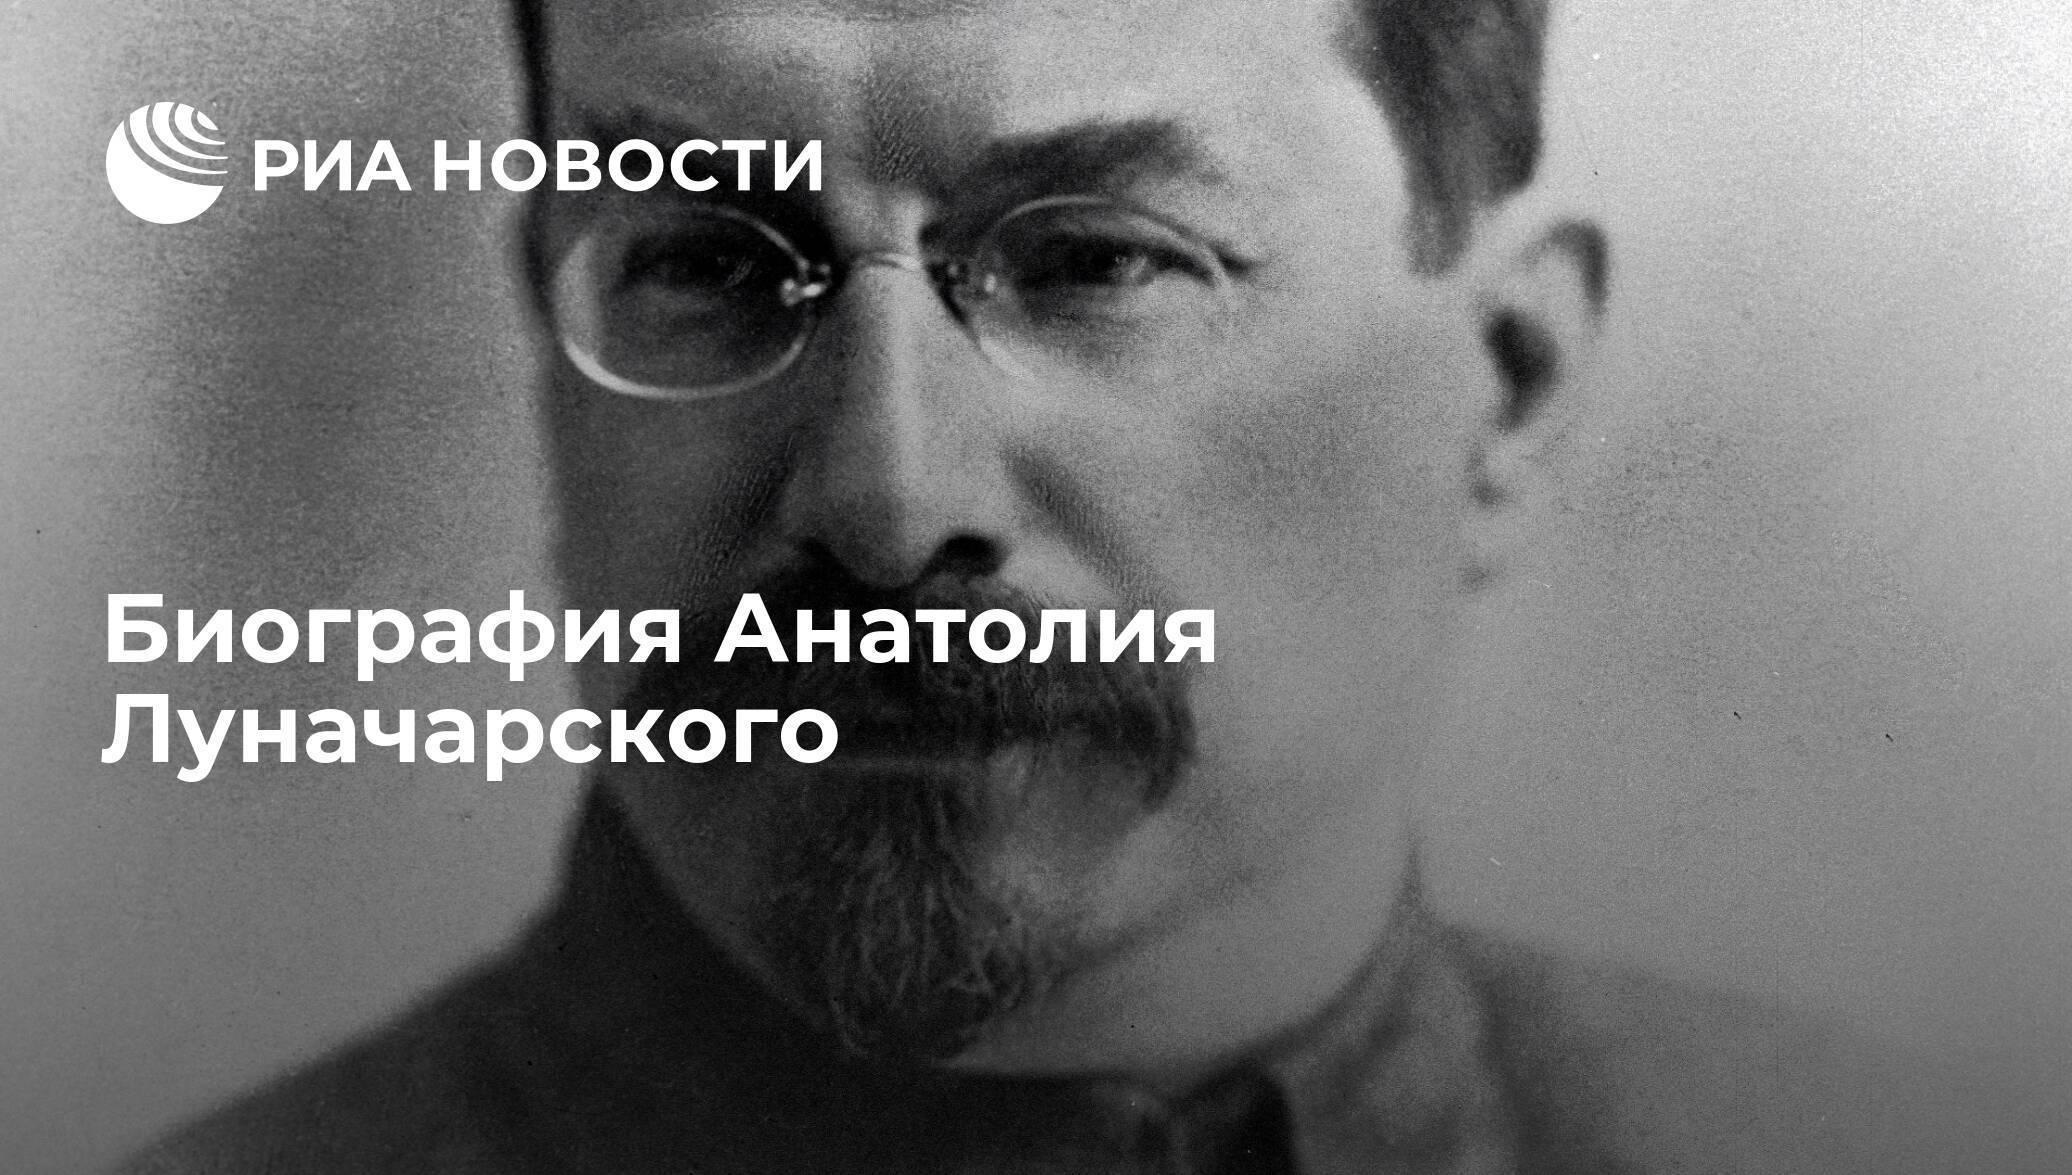 Луначарский, анатолий васильевич википедия